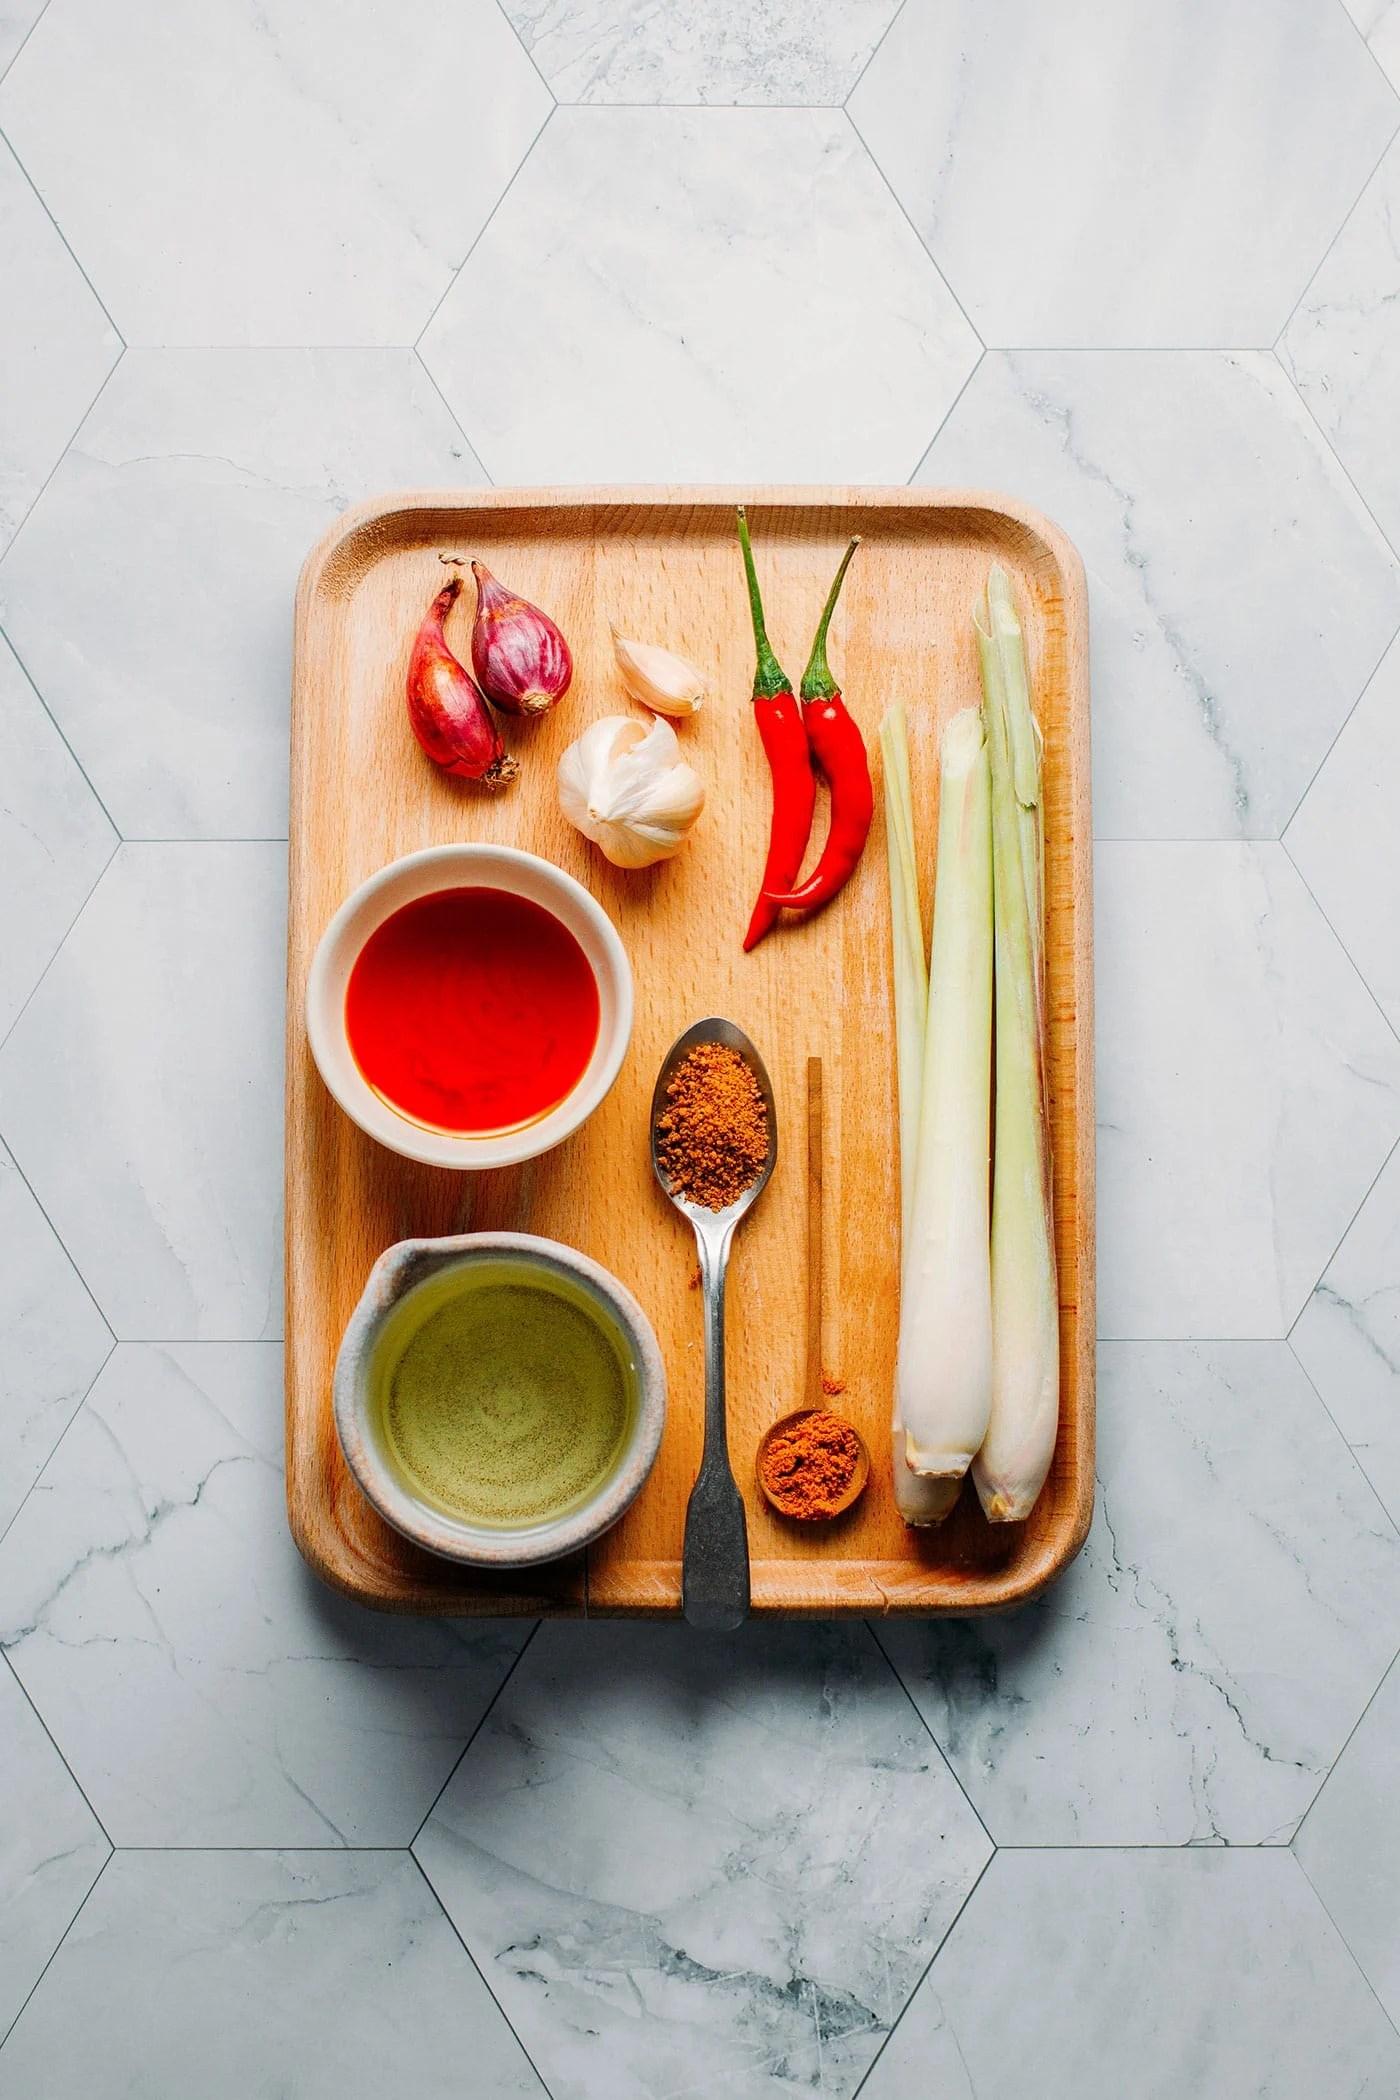 How to Make Vegan Sate